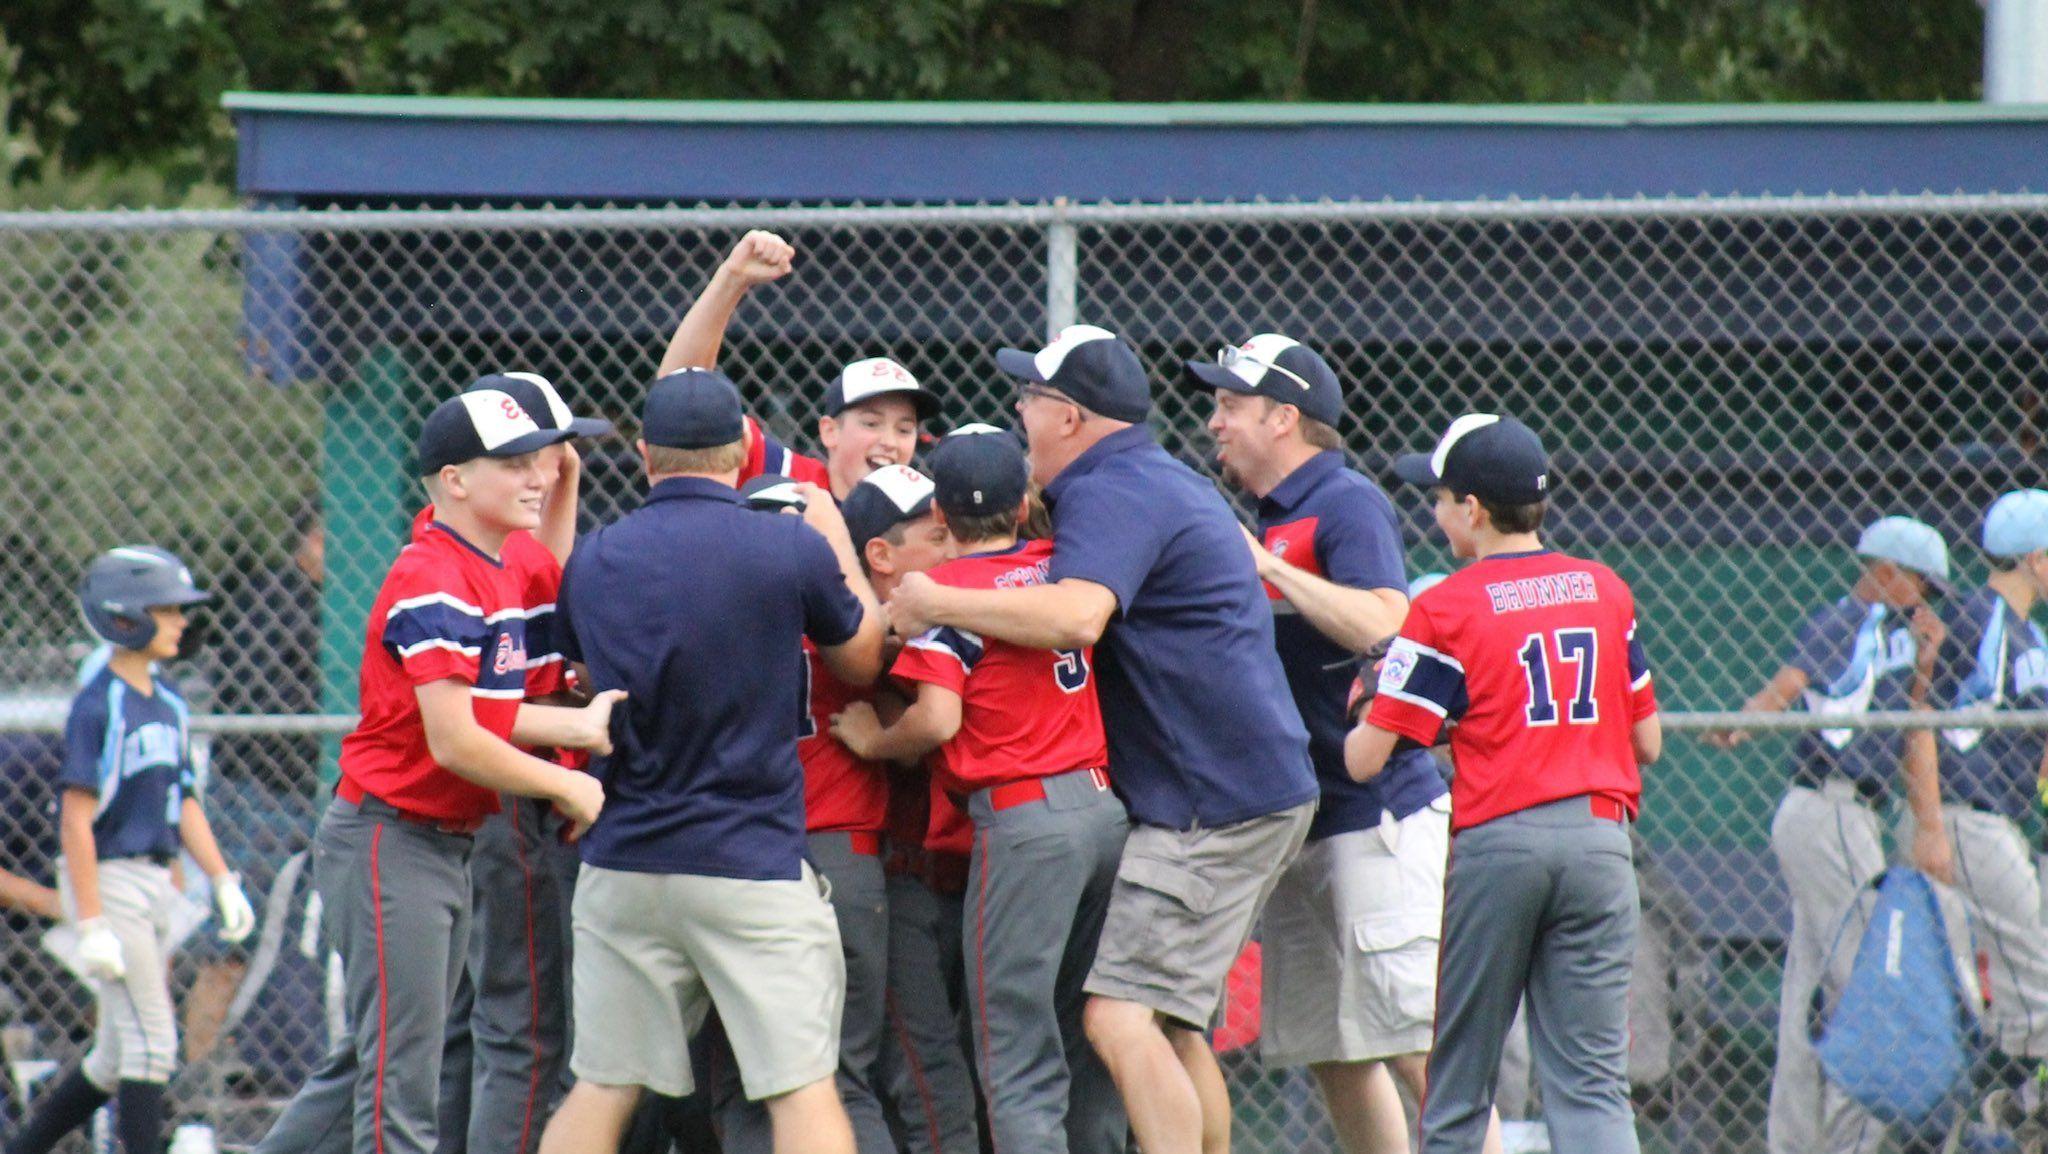 Wisconsin little league team heads to next level